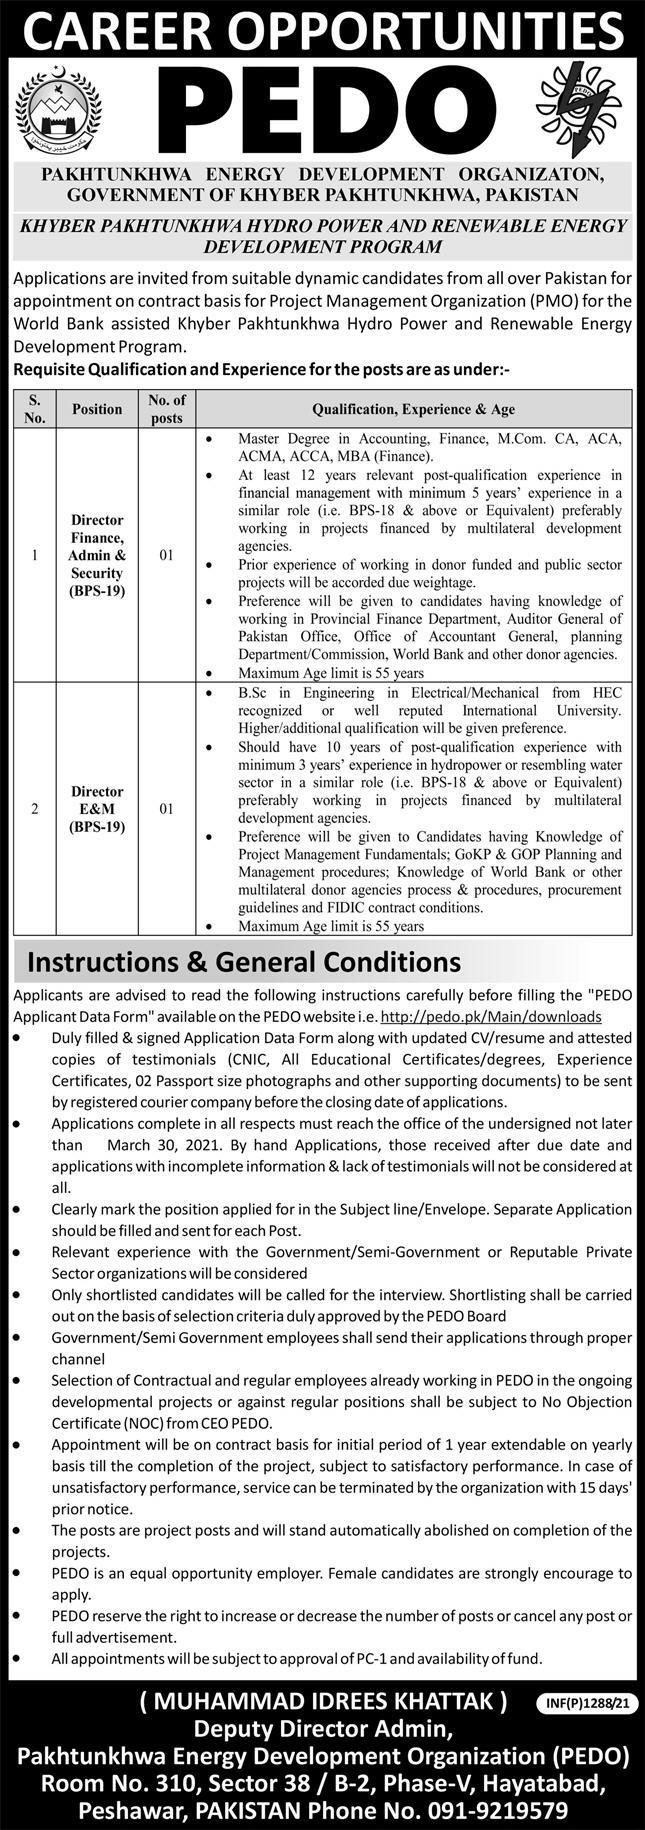 Khyber-Pakhtunkhwa-Hydro-Power-And-Renewable-Energy-Development-Program-jobs-opportunities